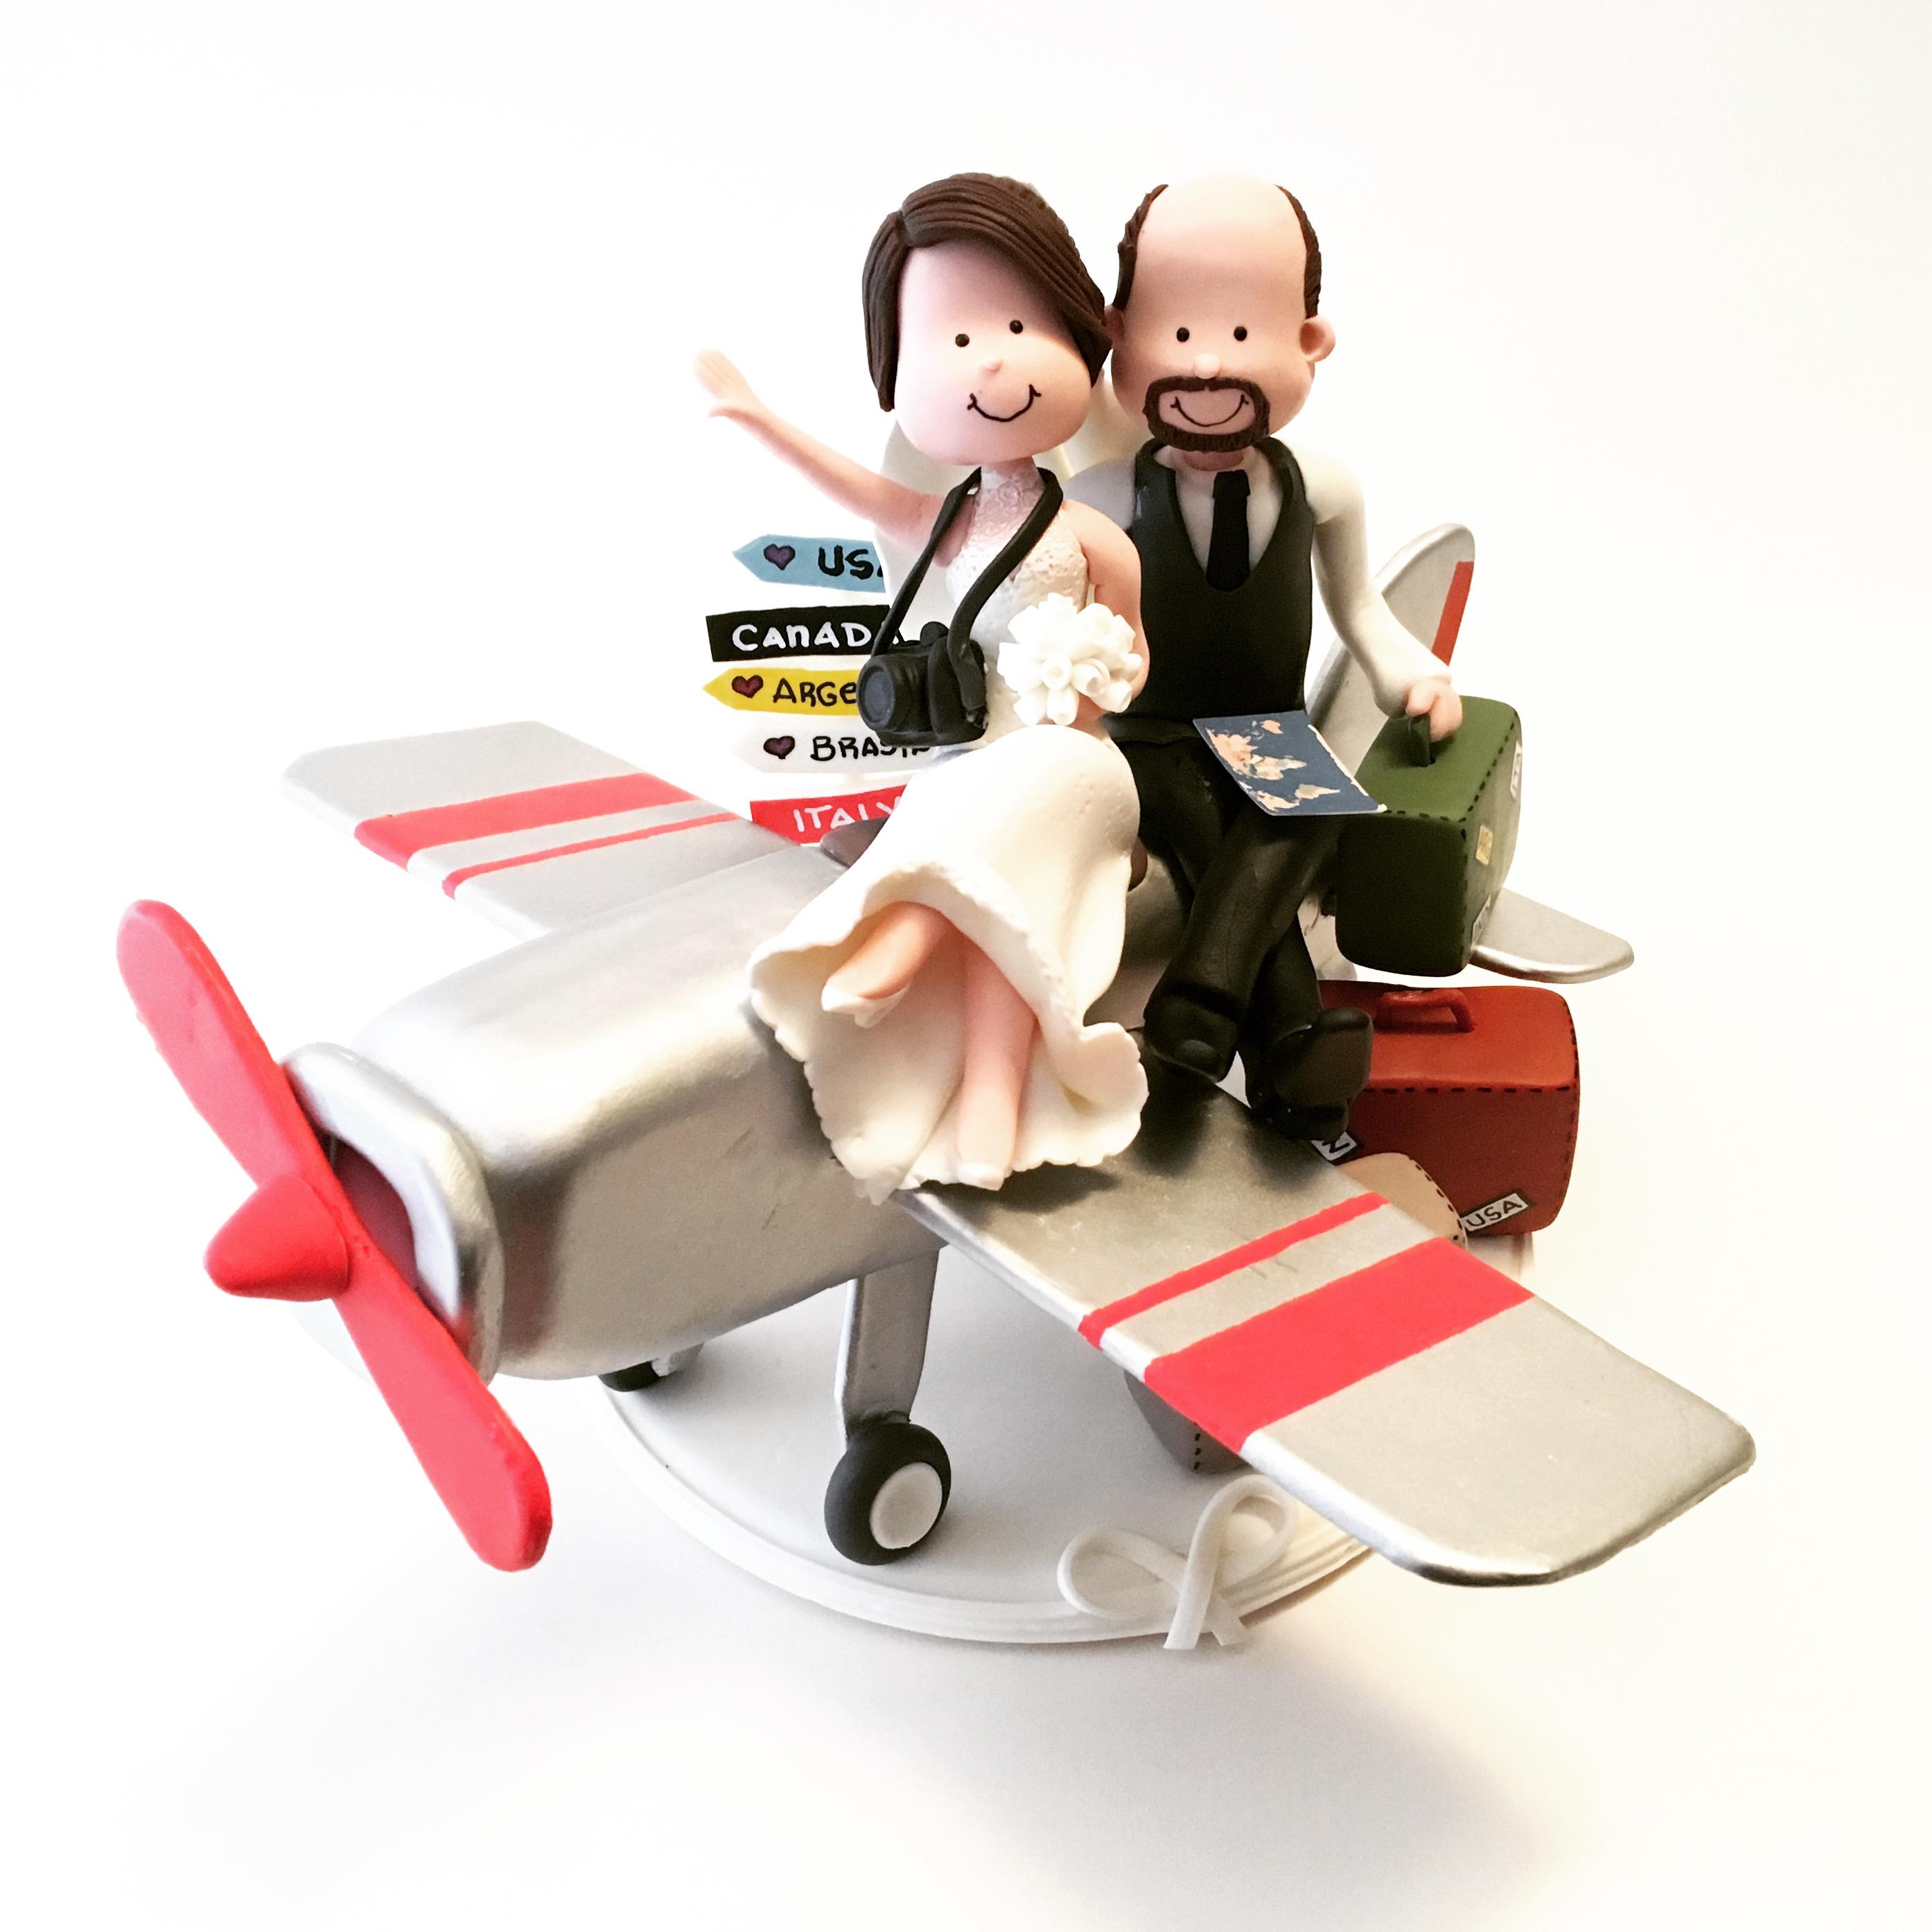 wedding-cake-topper-airplane-travel-vintage-2